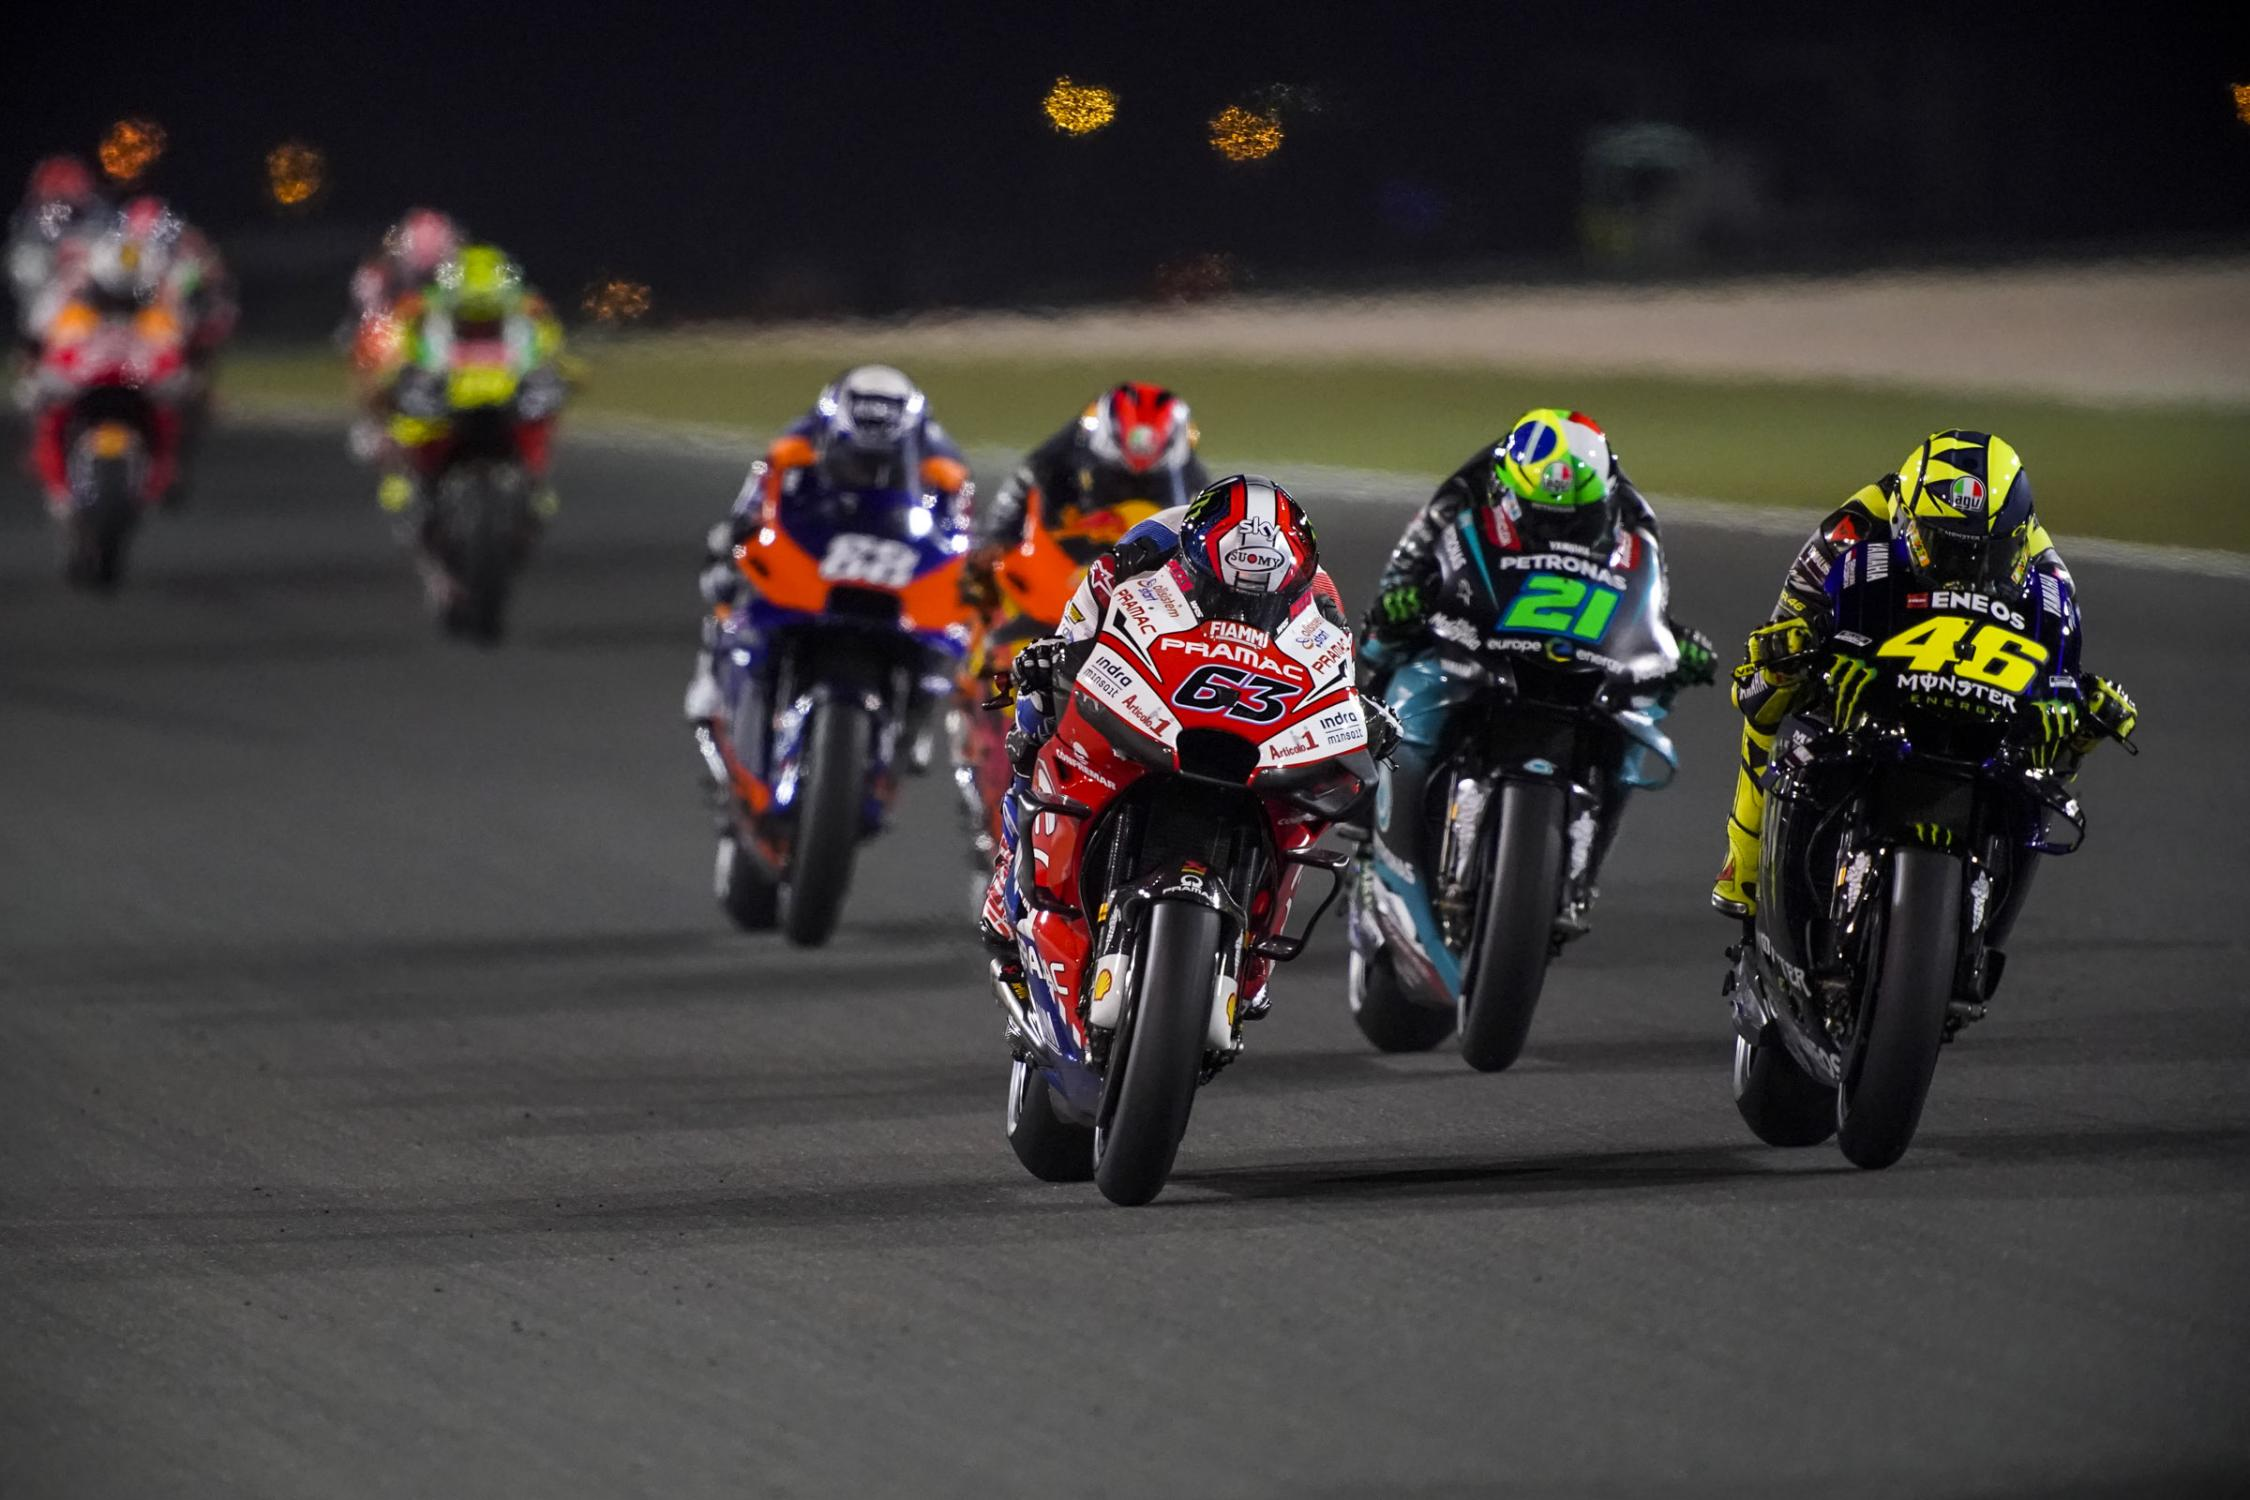 MOTO GP- Grand Prix du Qatar – Losail-10 mars 2019 - Page 3 Bagnaia-rossi-qatar-motogp-2019-peloton